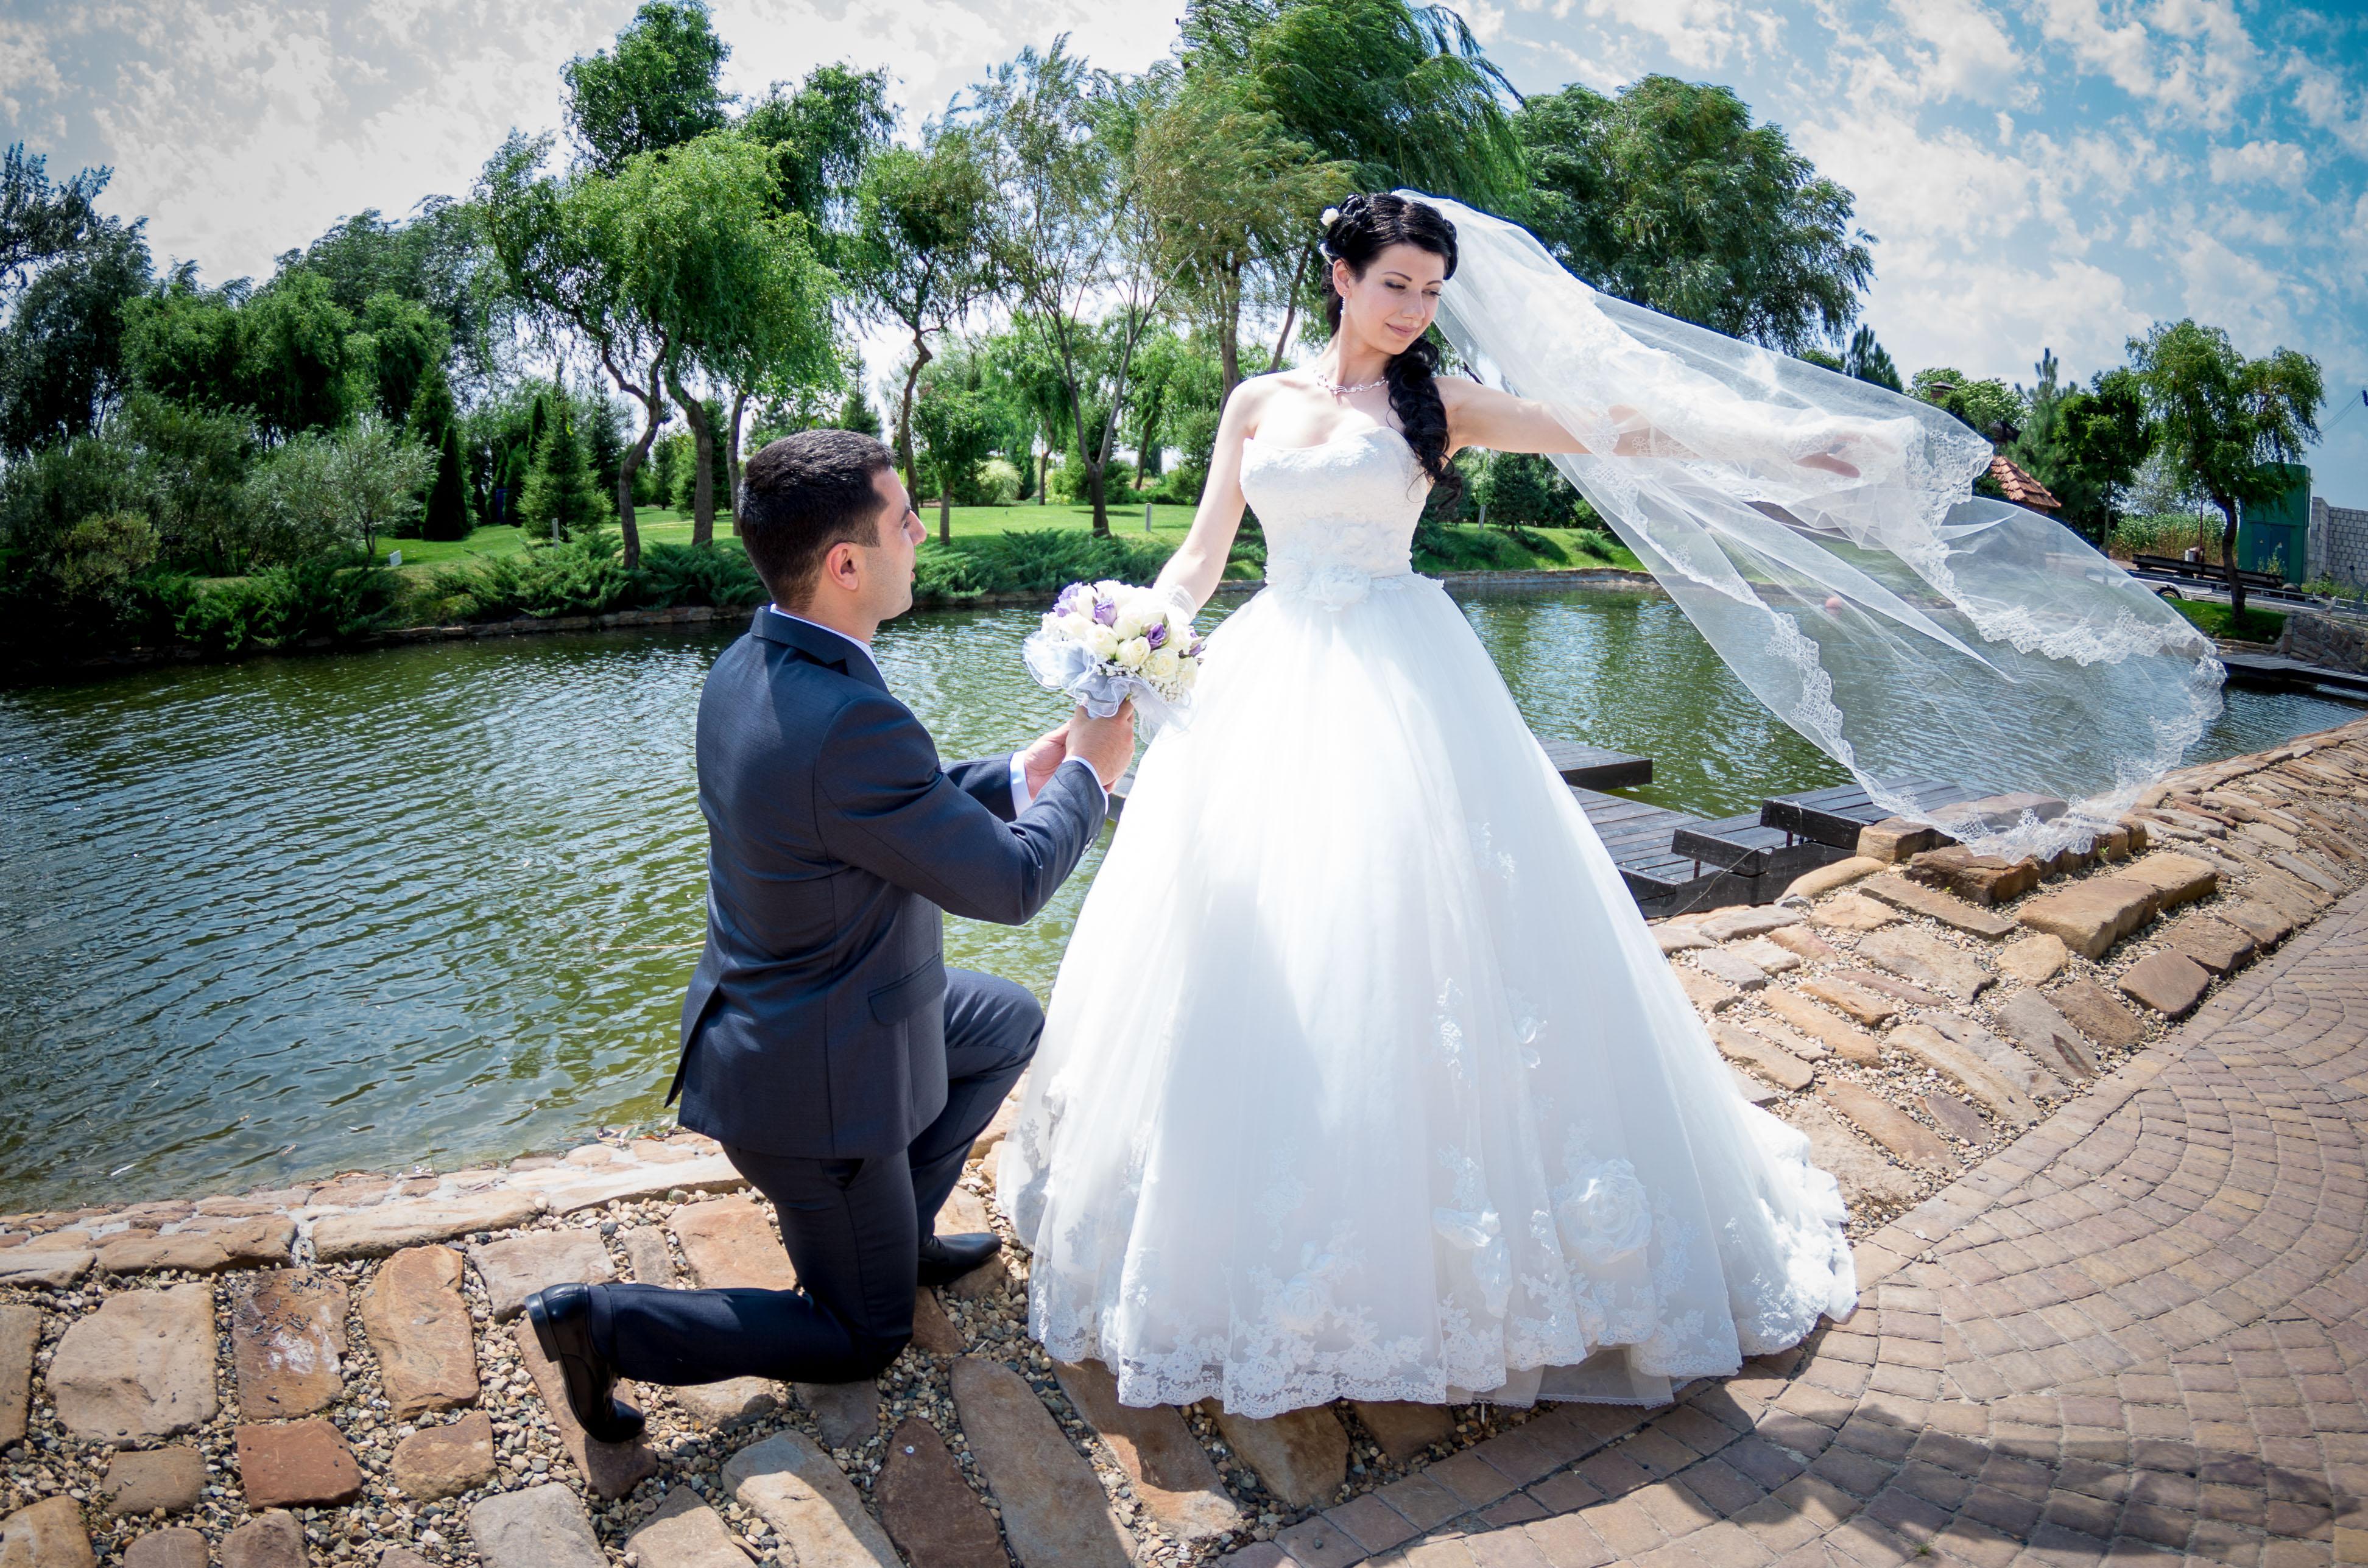 фото свадьбы таты абрамсон и блюменкранца